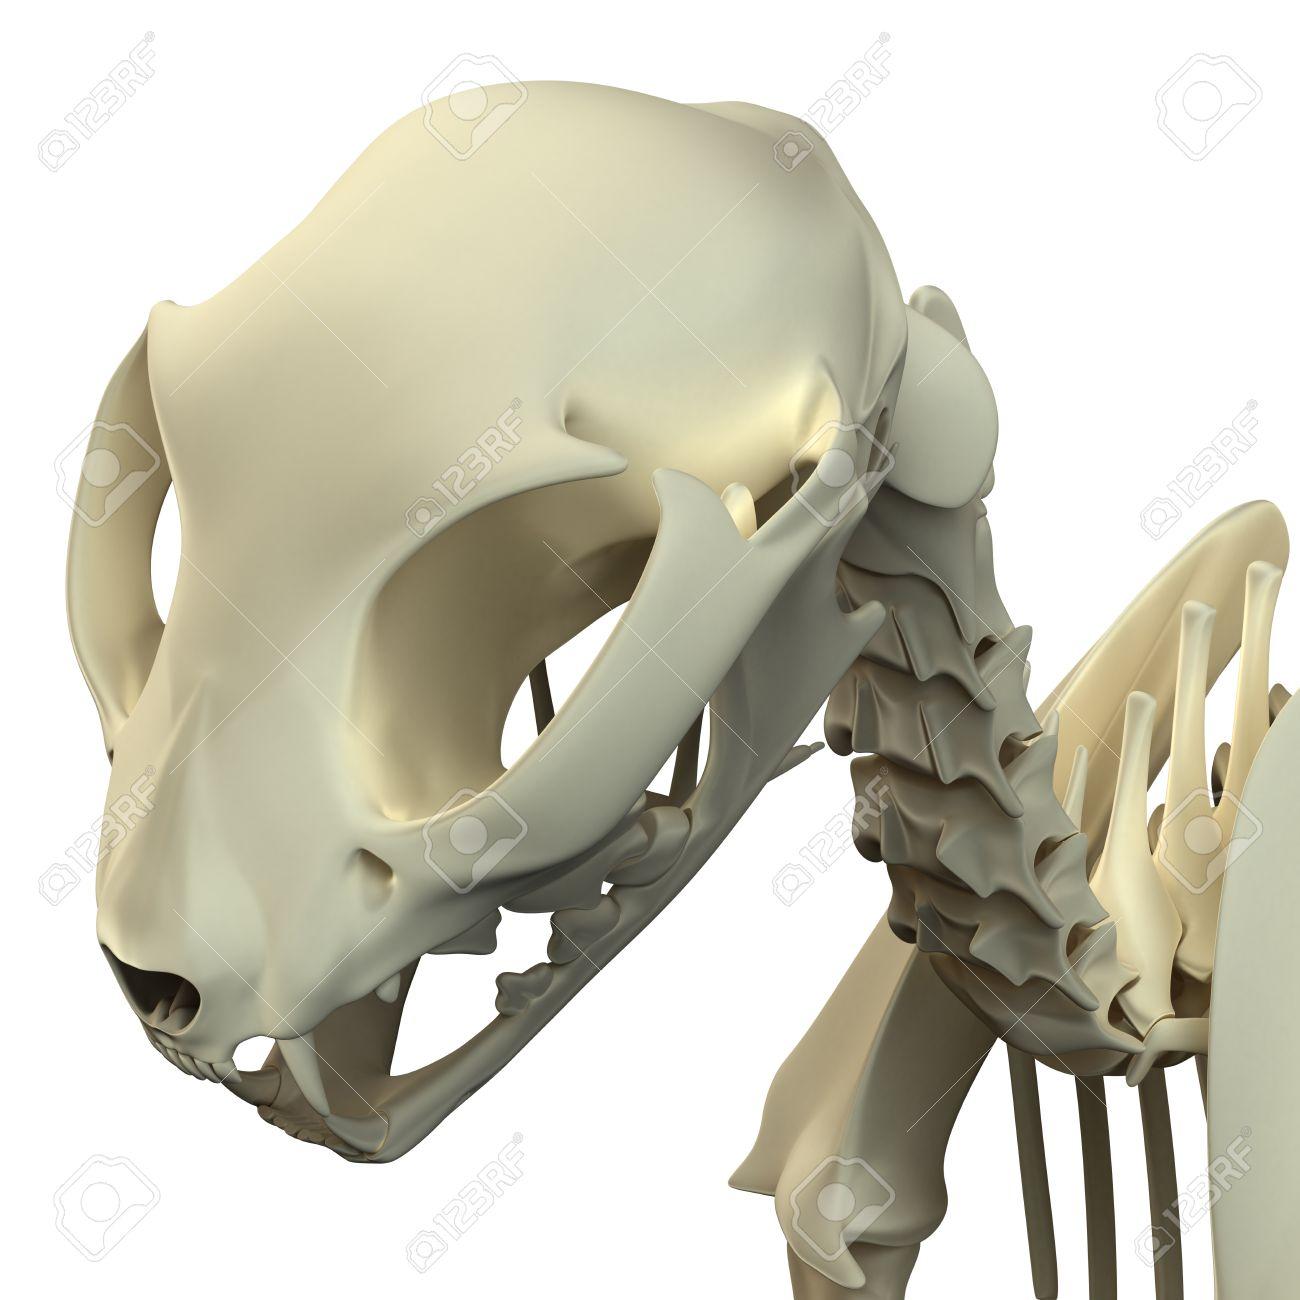 Cat Skull Anatomy - Anatomy Of A Cat Cranium Stock Photo, Picture ...